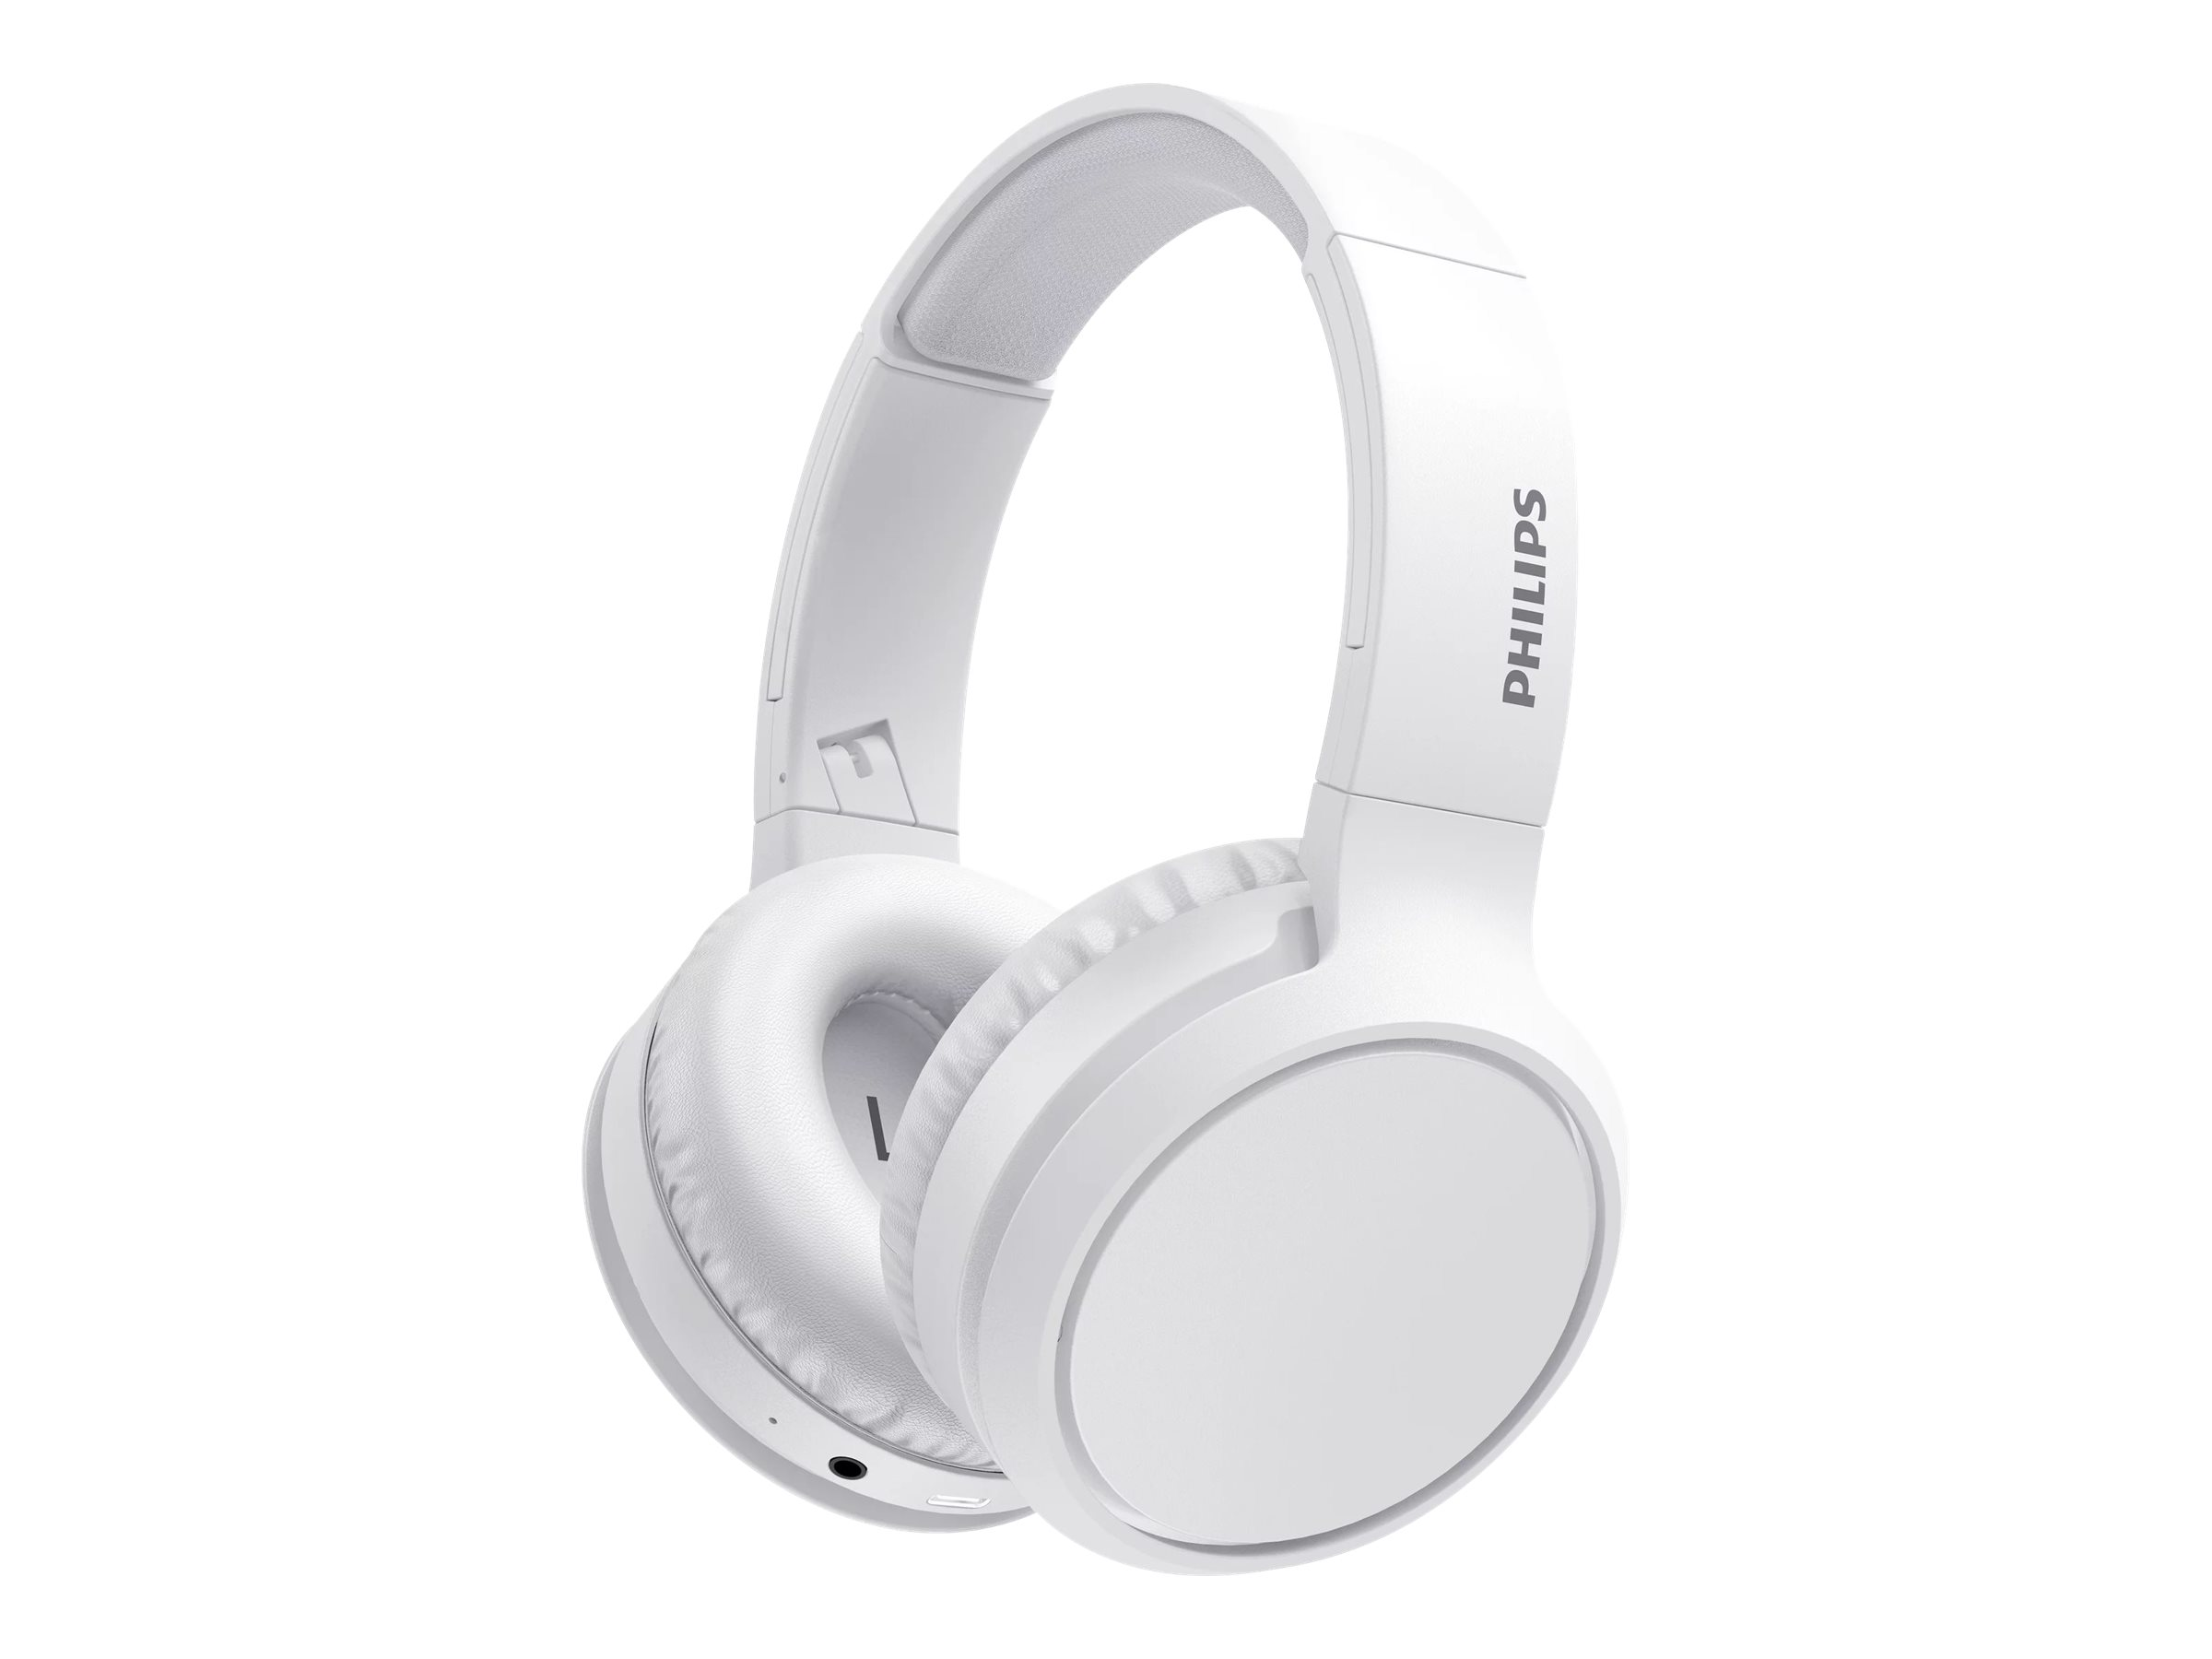 Philips TAH5205WT - Kopfhörer mit Mikrofon - ohrumschliessend - Bluetooth - kabellos - weiss